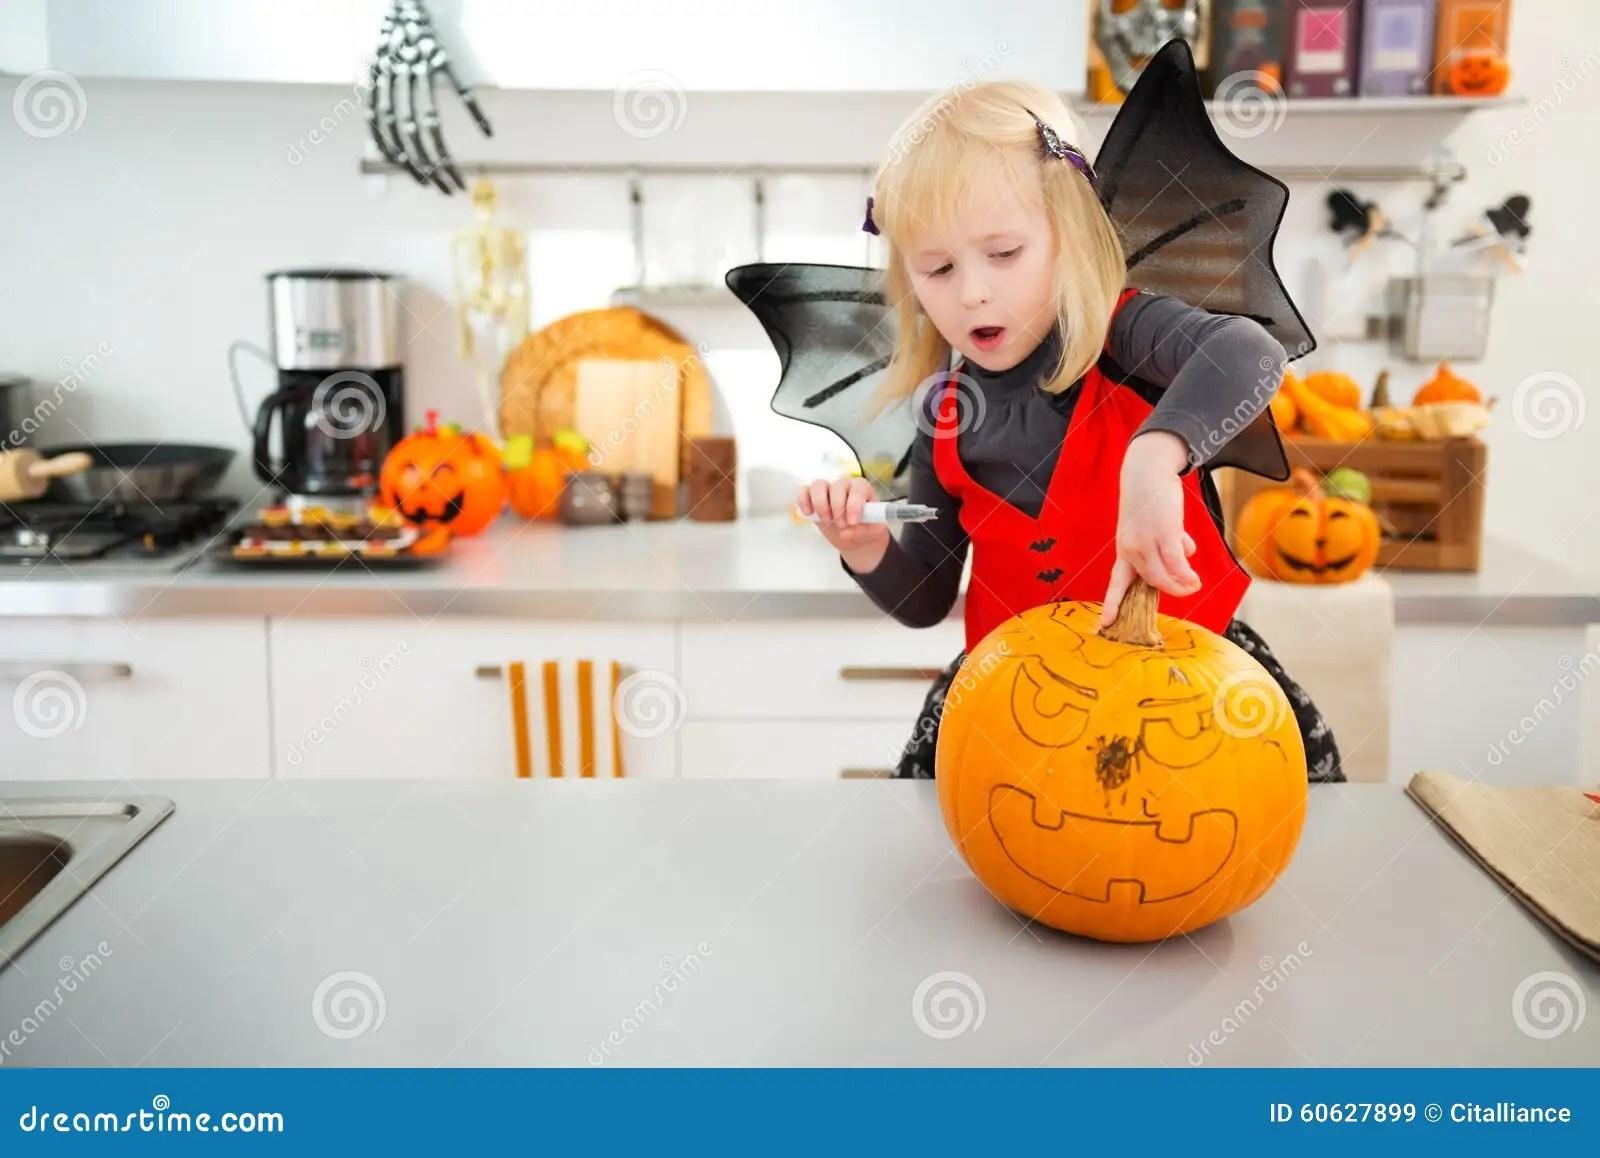 kitchen lanterns chandeliers 万圣夜打扮了创造南瓜杰克o灯笼的女孩库存图片 图片包括有服装 准备 棒服装的感兴趣的白肤金发的女孩使用雕刻的钢板蜡纸在万圣夜党的大橙色南瓜杰克o灯笼在装饰的厨房里传统秋天假日